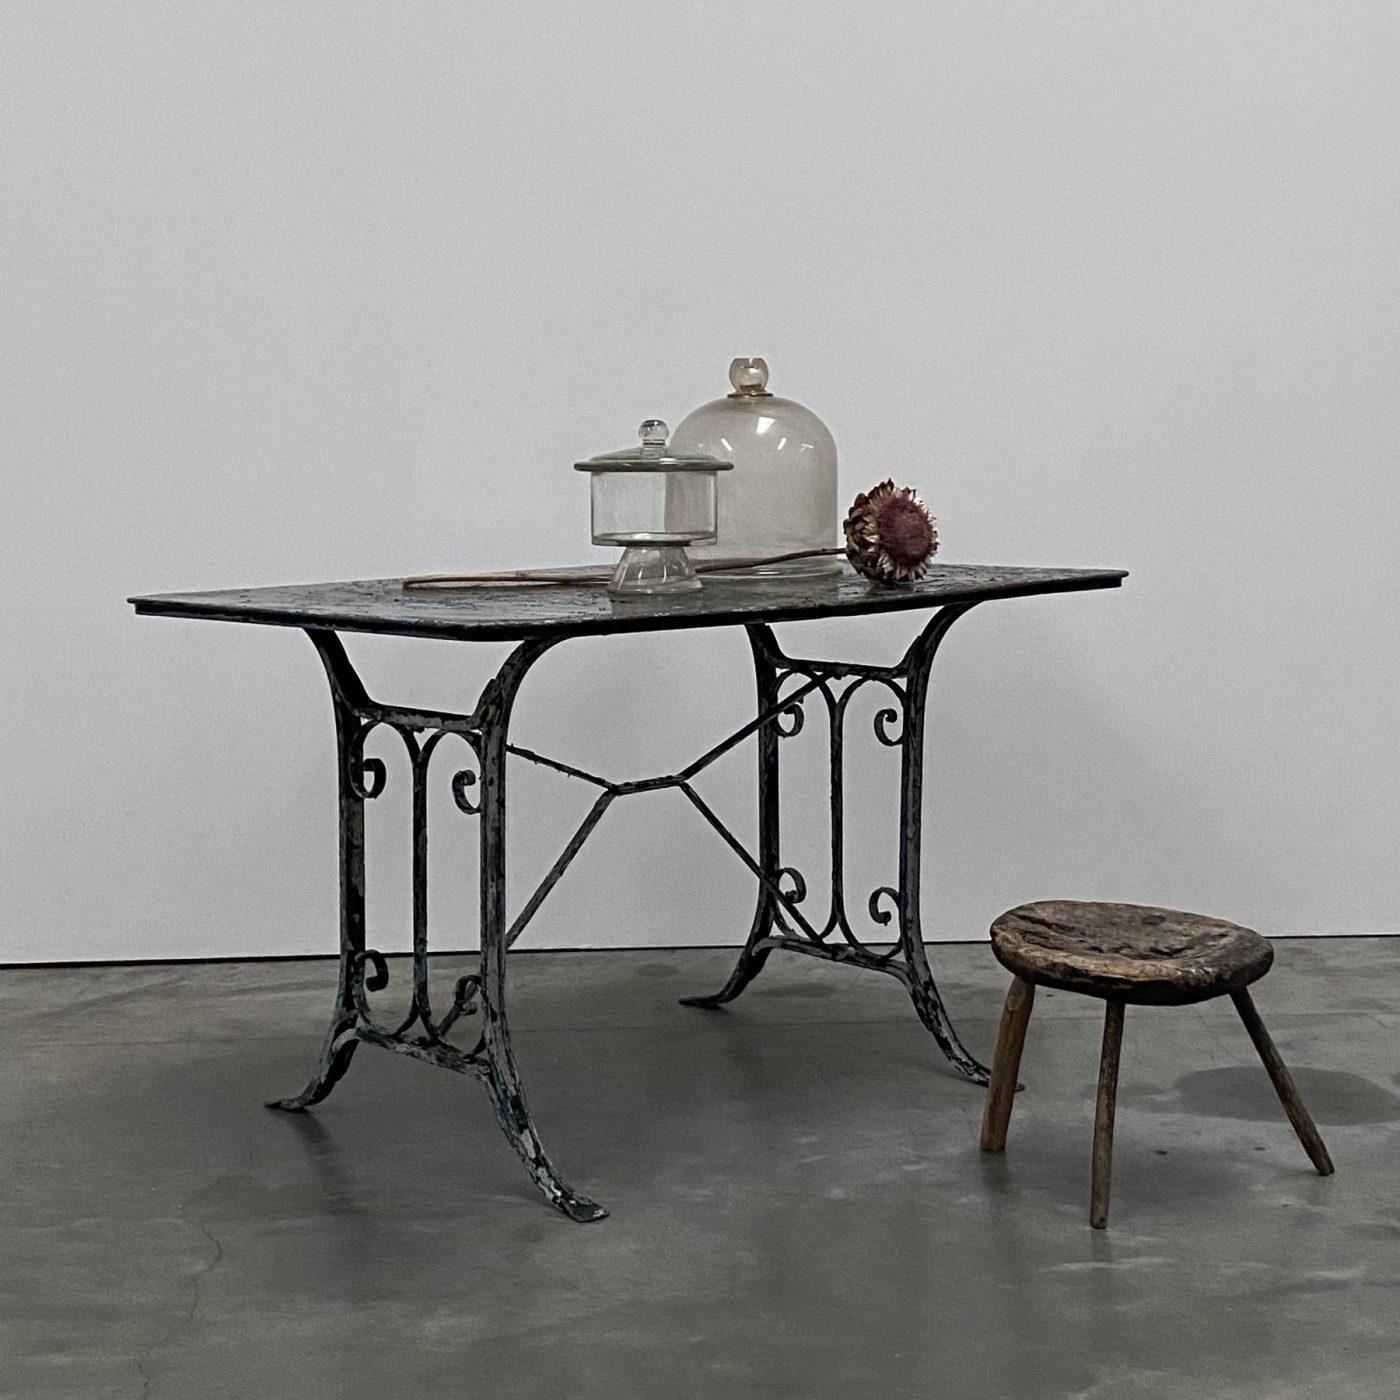 objet-vagabond-garden-table0001